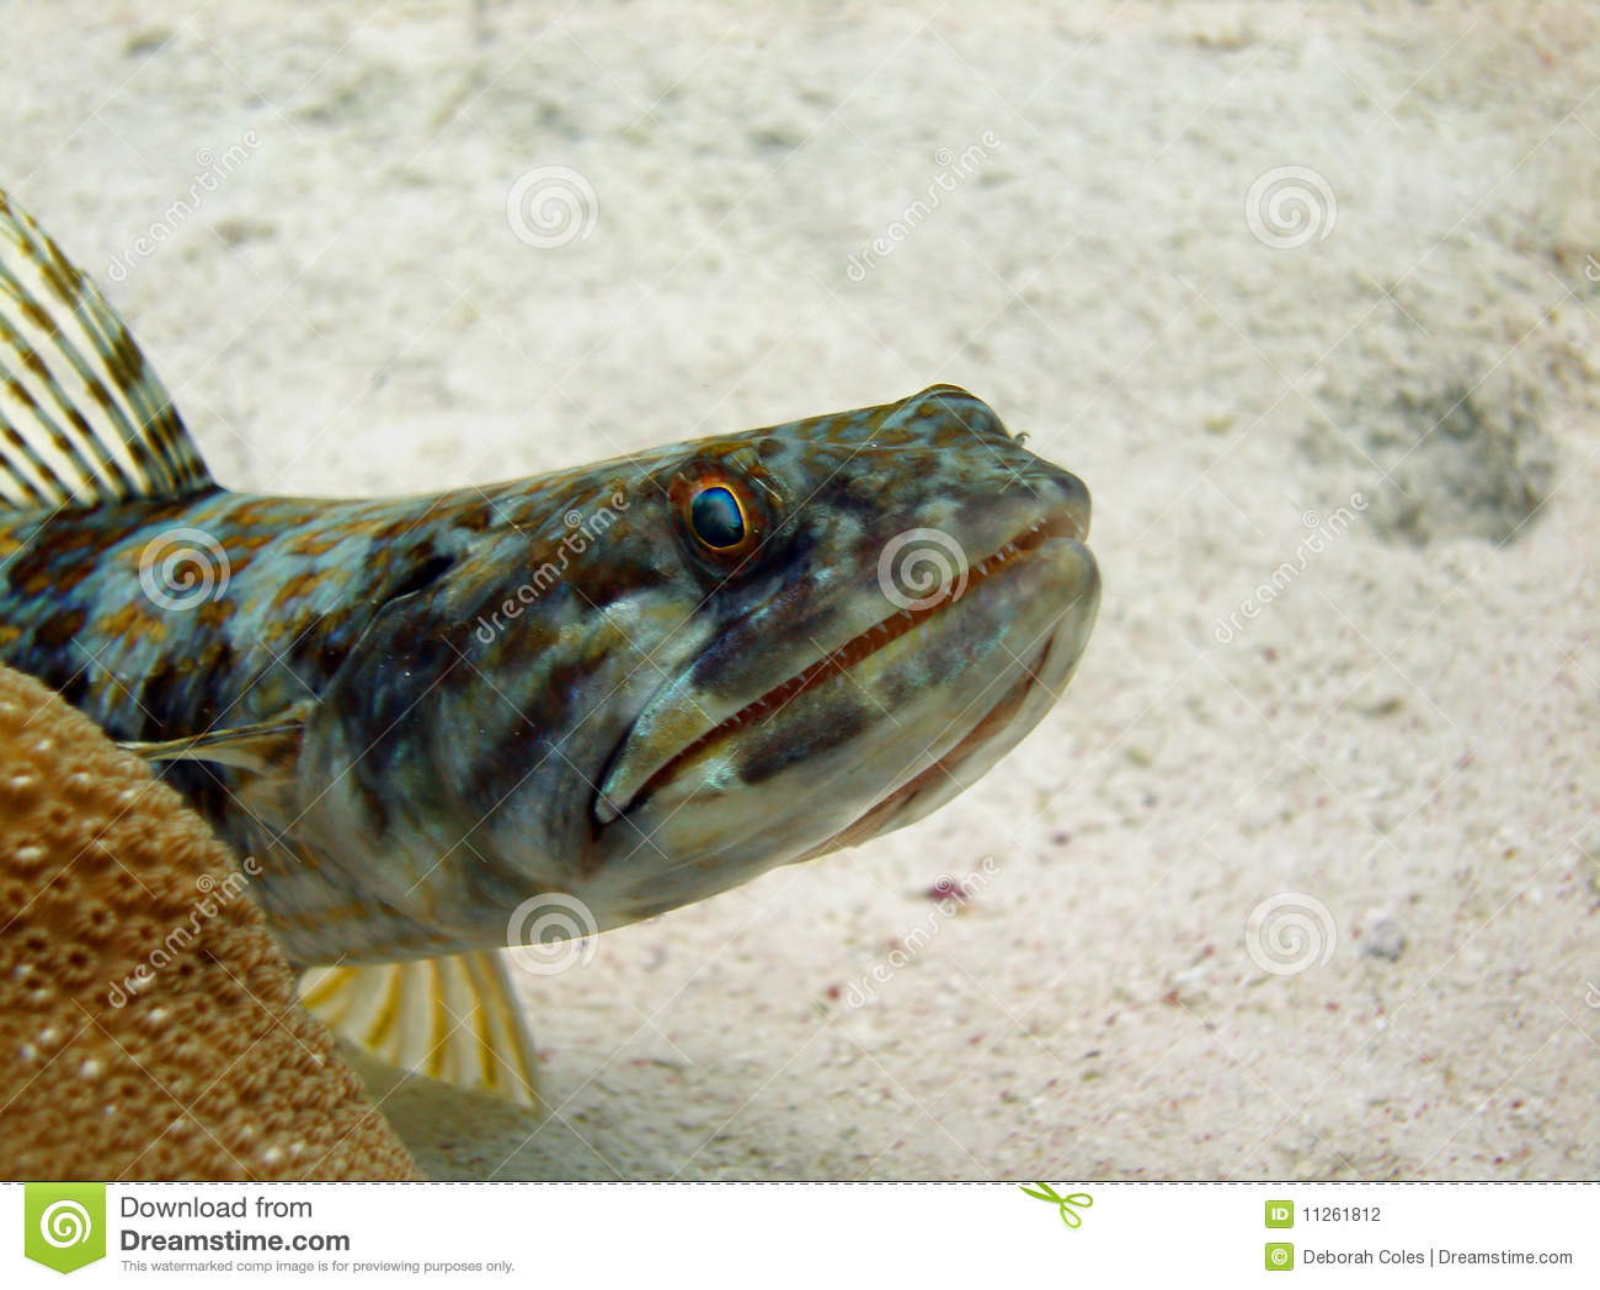 Lizard Fish Royalty Free Stock Image